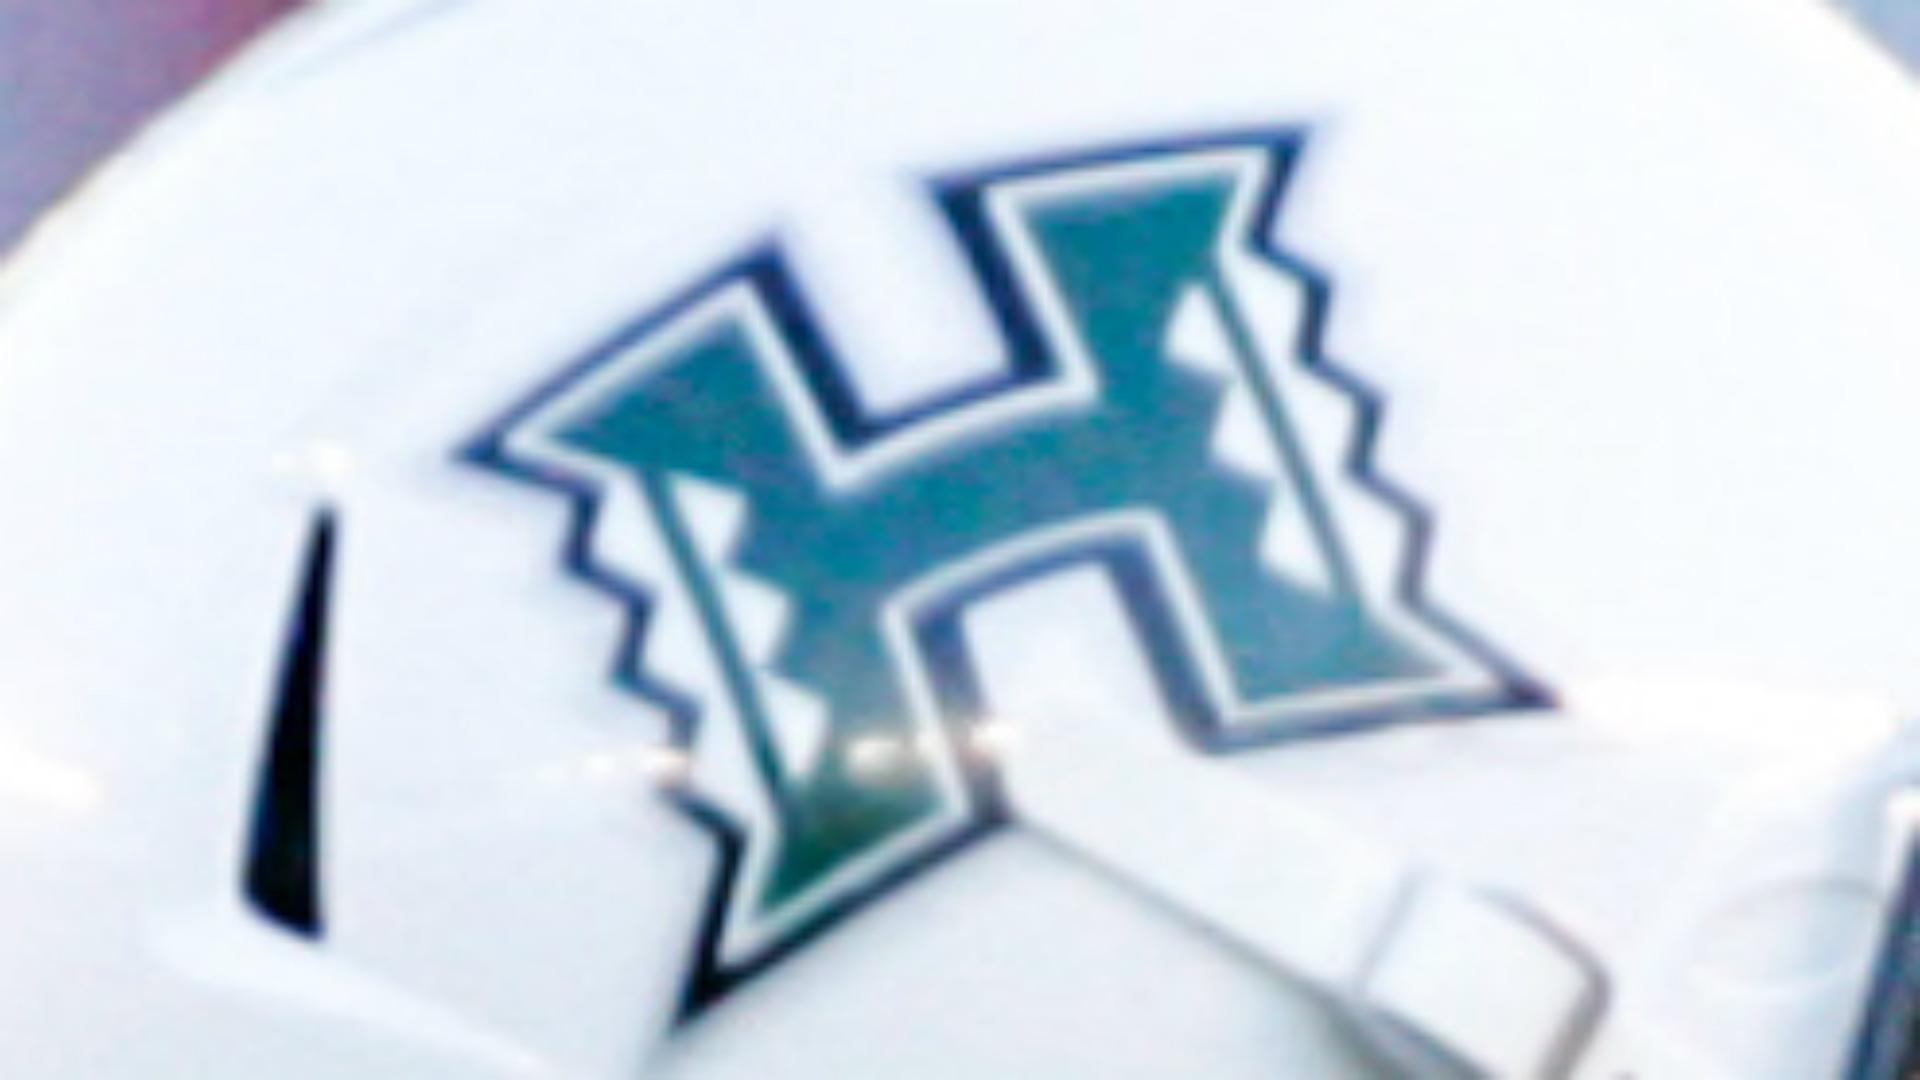 Hawaii linebacker Scheyenne Sanitoa dies at 21, university announces